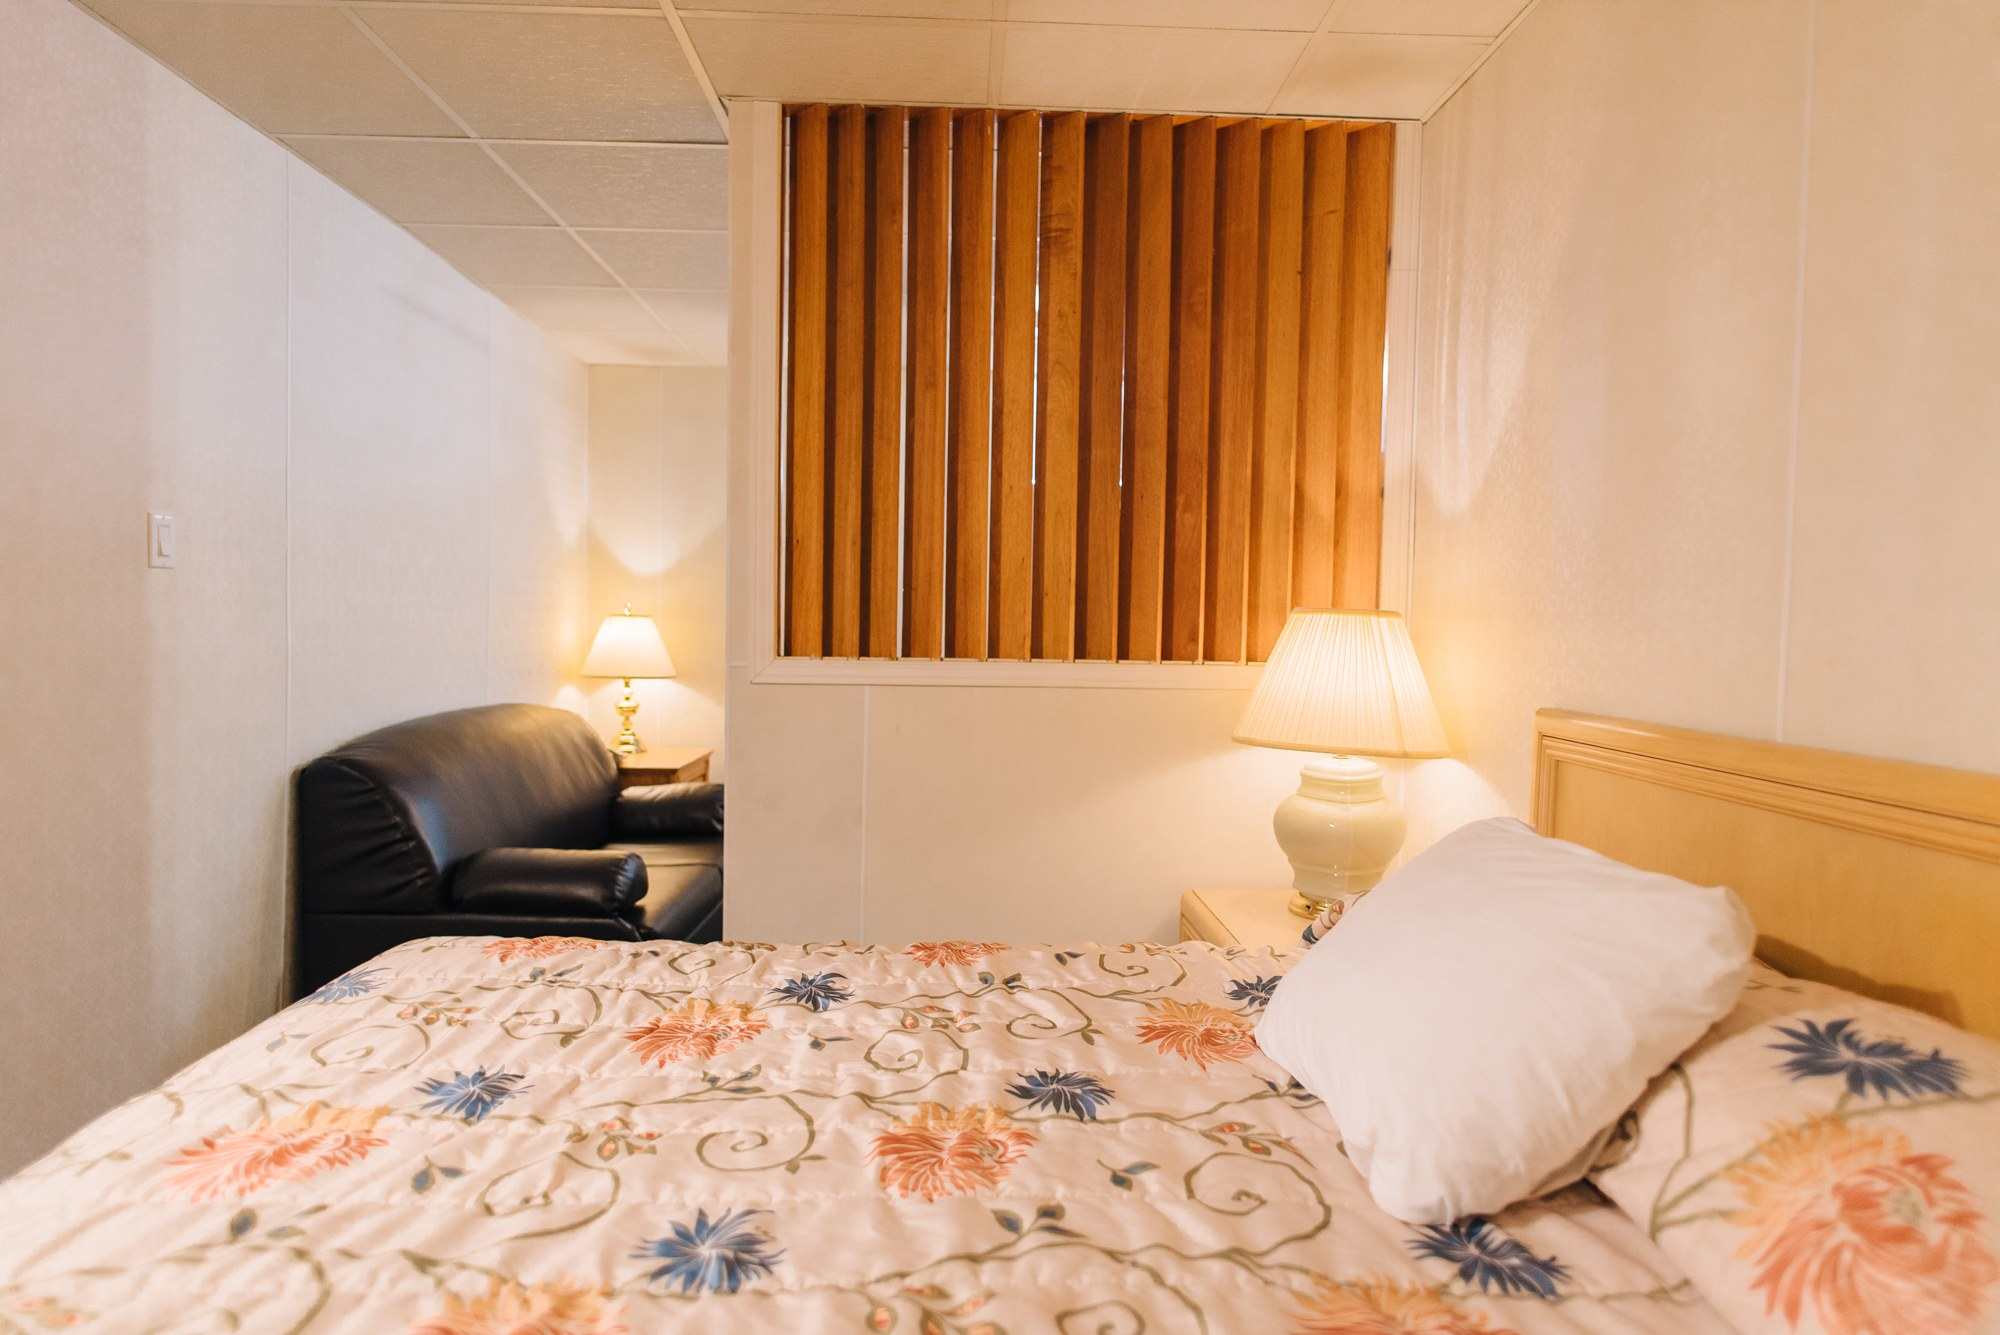 Hotel-centre-ville-rouyn-noranda-garçonnière-1